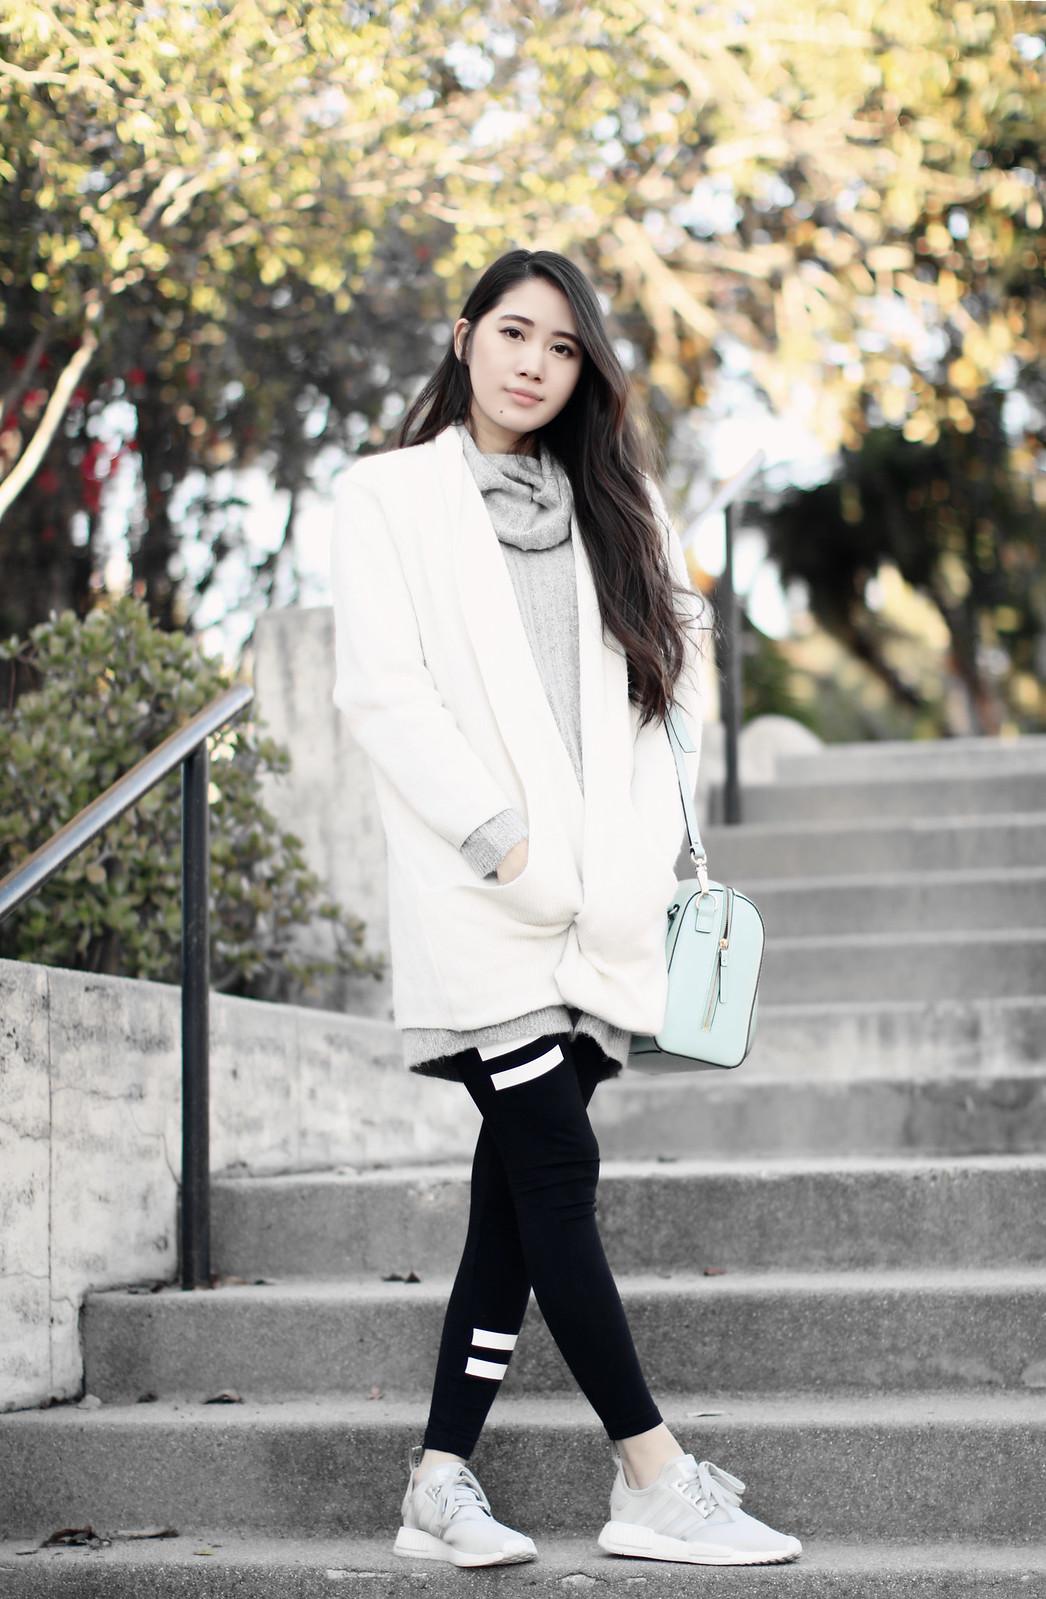 1532-ootd-fashion-style-tobi-cowl-neck-turtleneck-sweater-dress-asianfashion-koreanfashion-winterfashion-clothestoyouuu-elizabeeetht